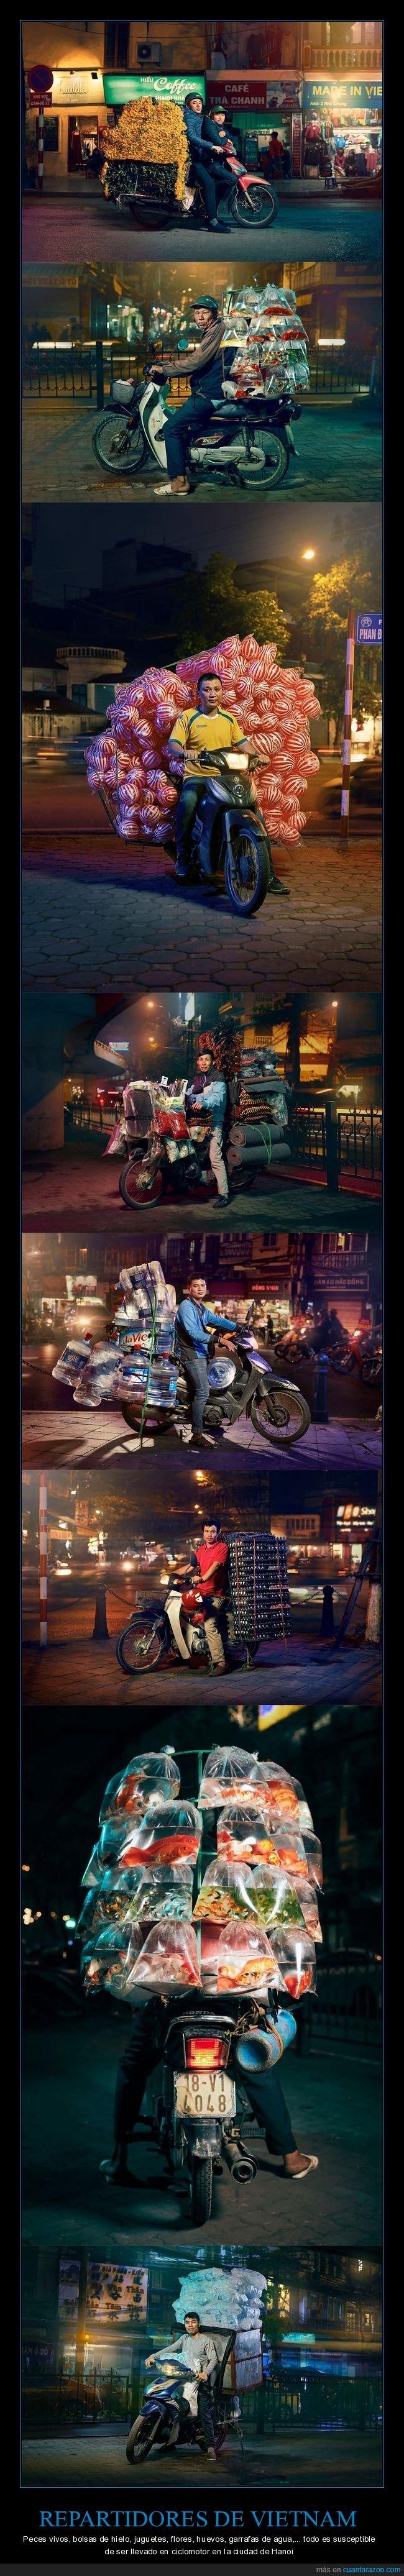 motos,repartidores,vietnam